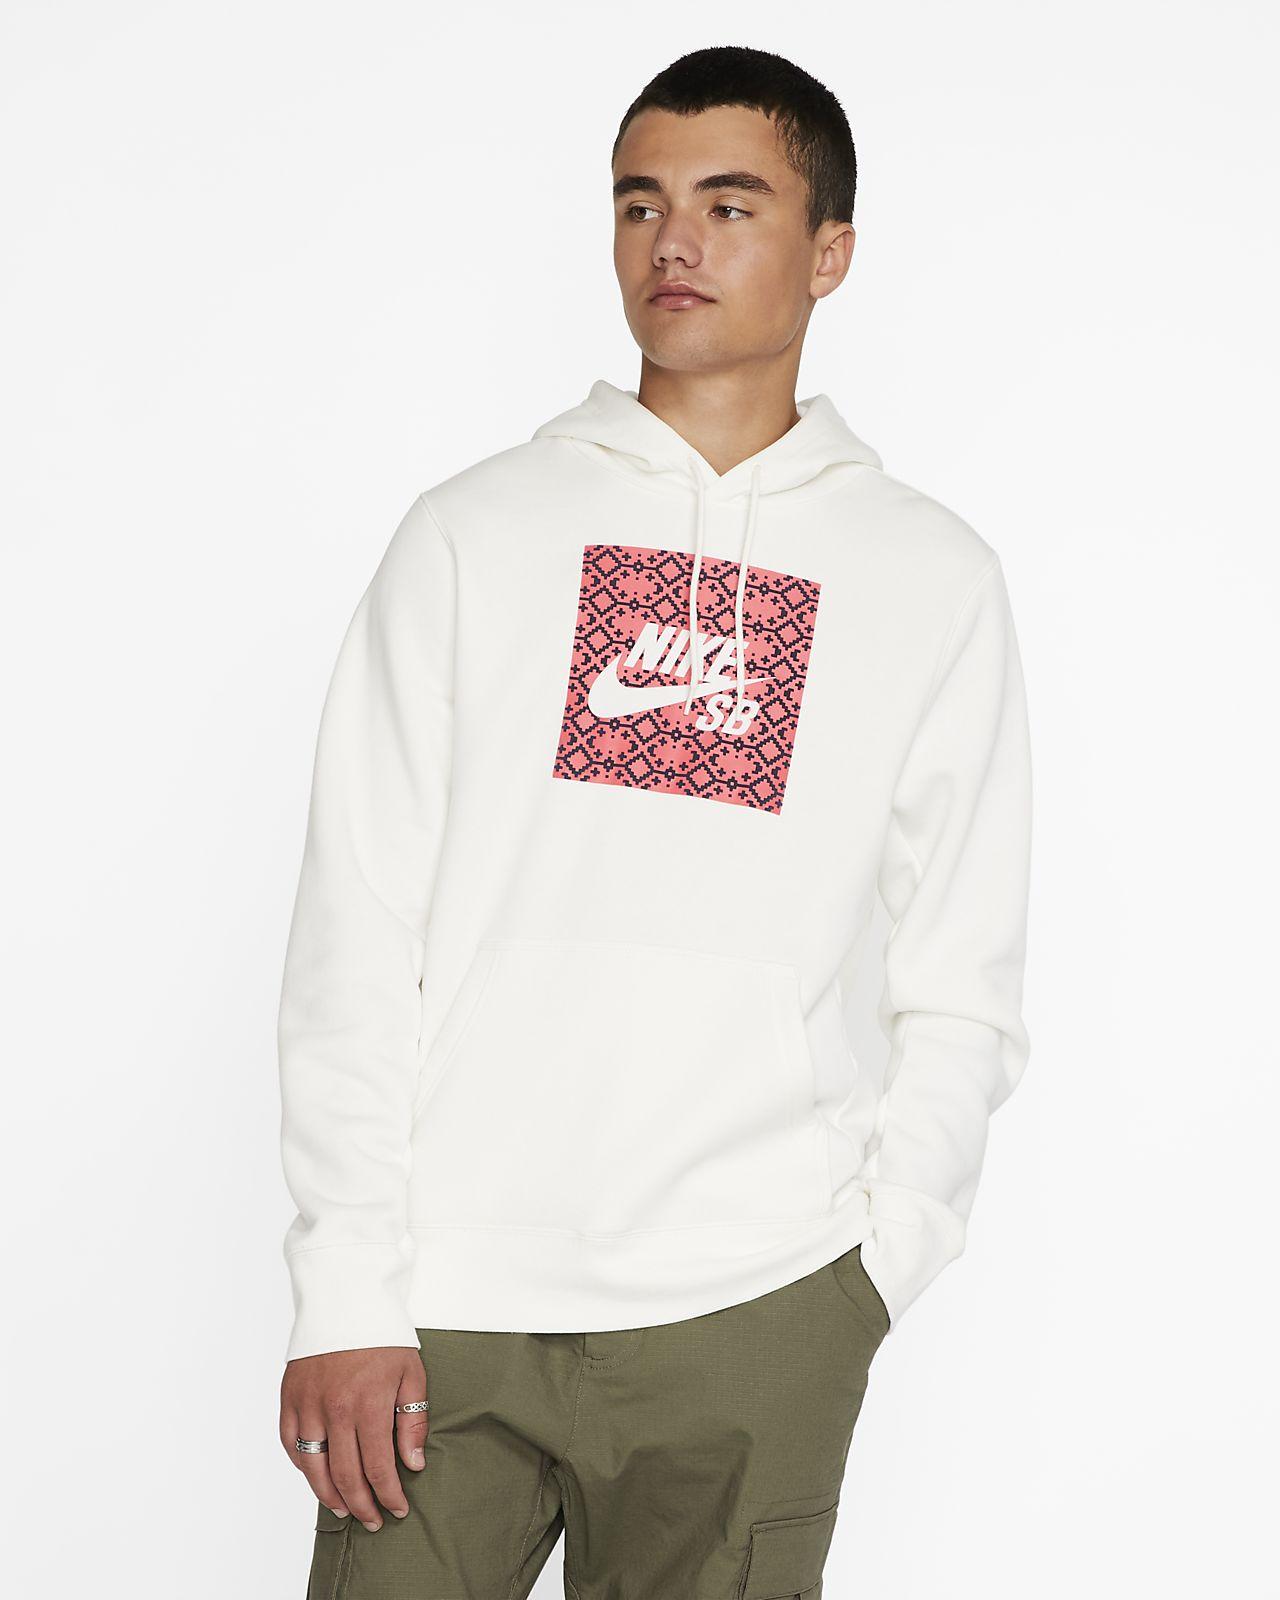 Nike SB Sudadera con capucha de skateboard - Hombre